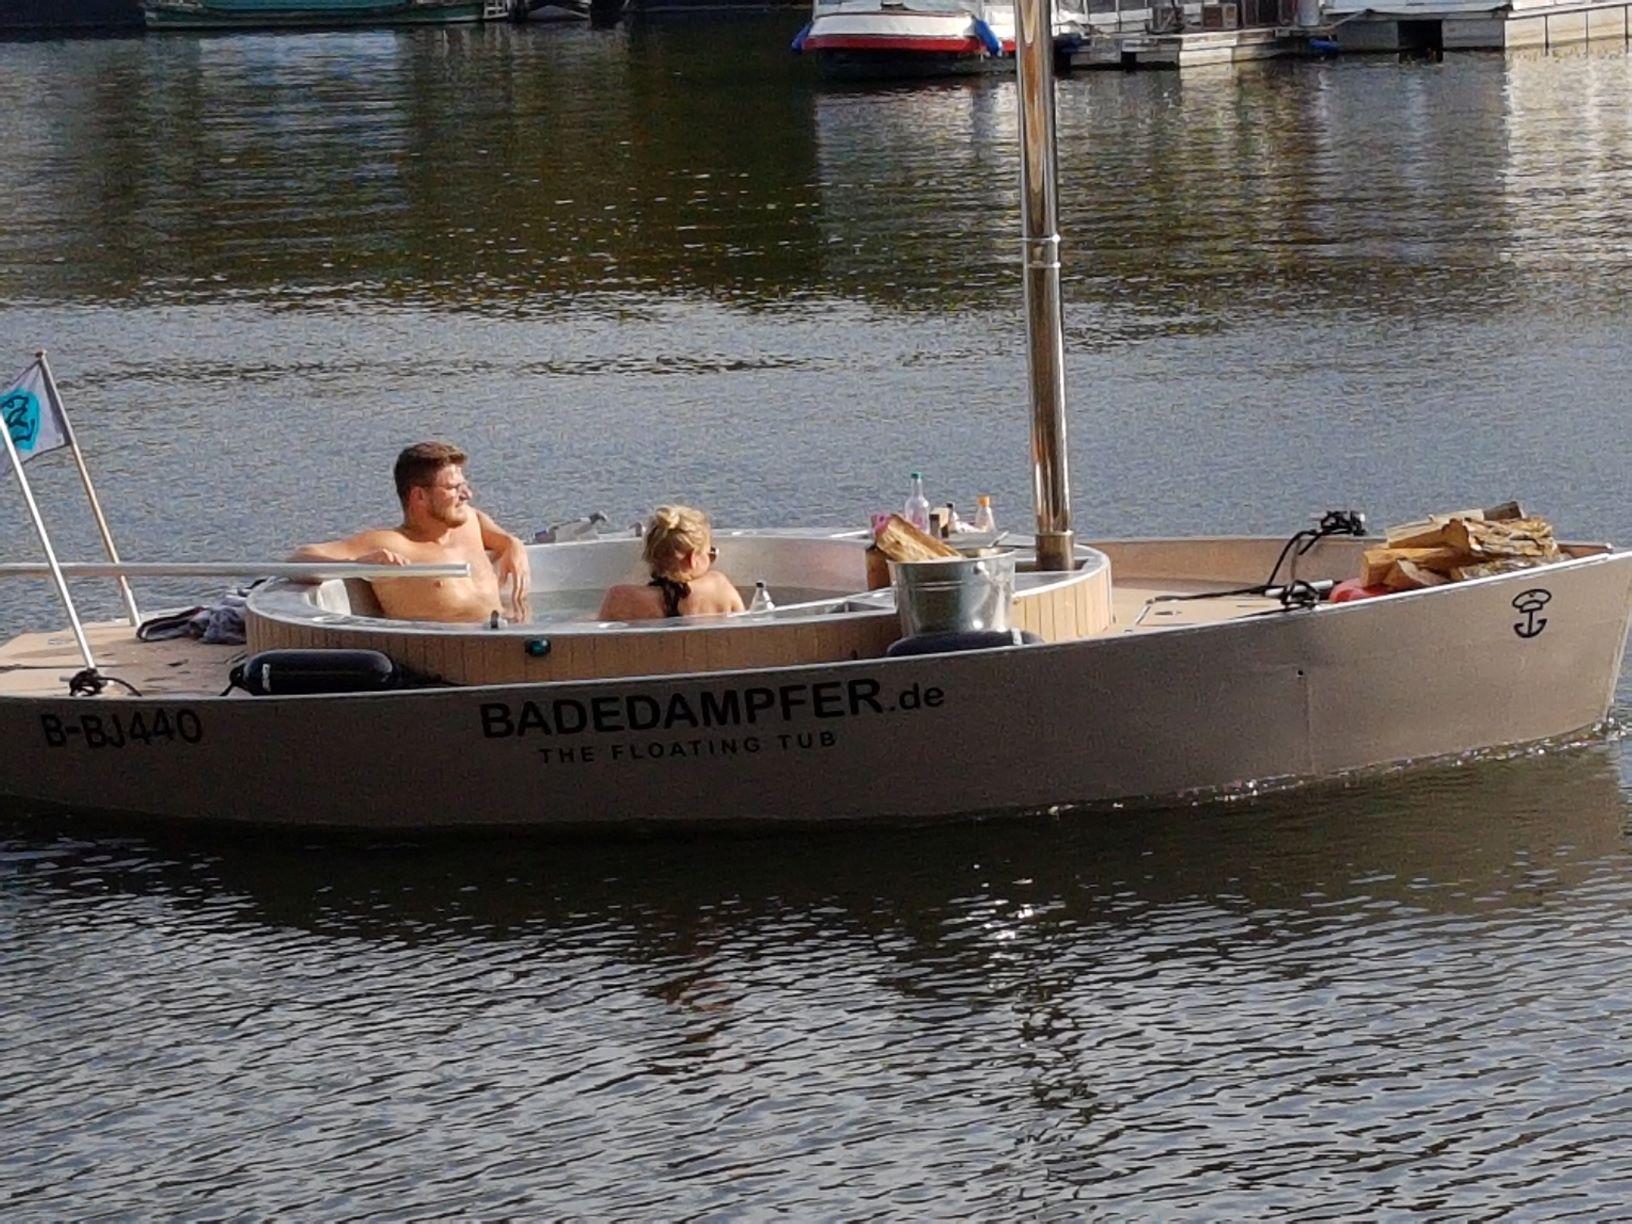 jacuzzi boat.jpg